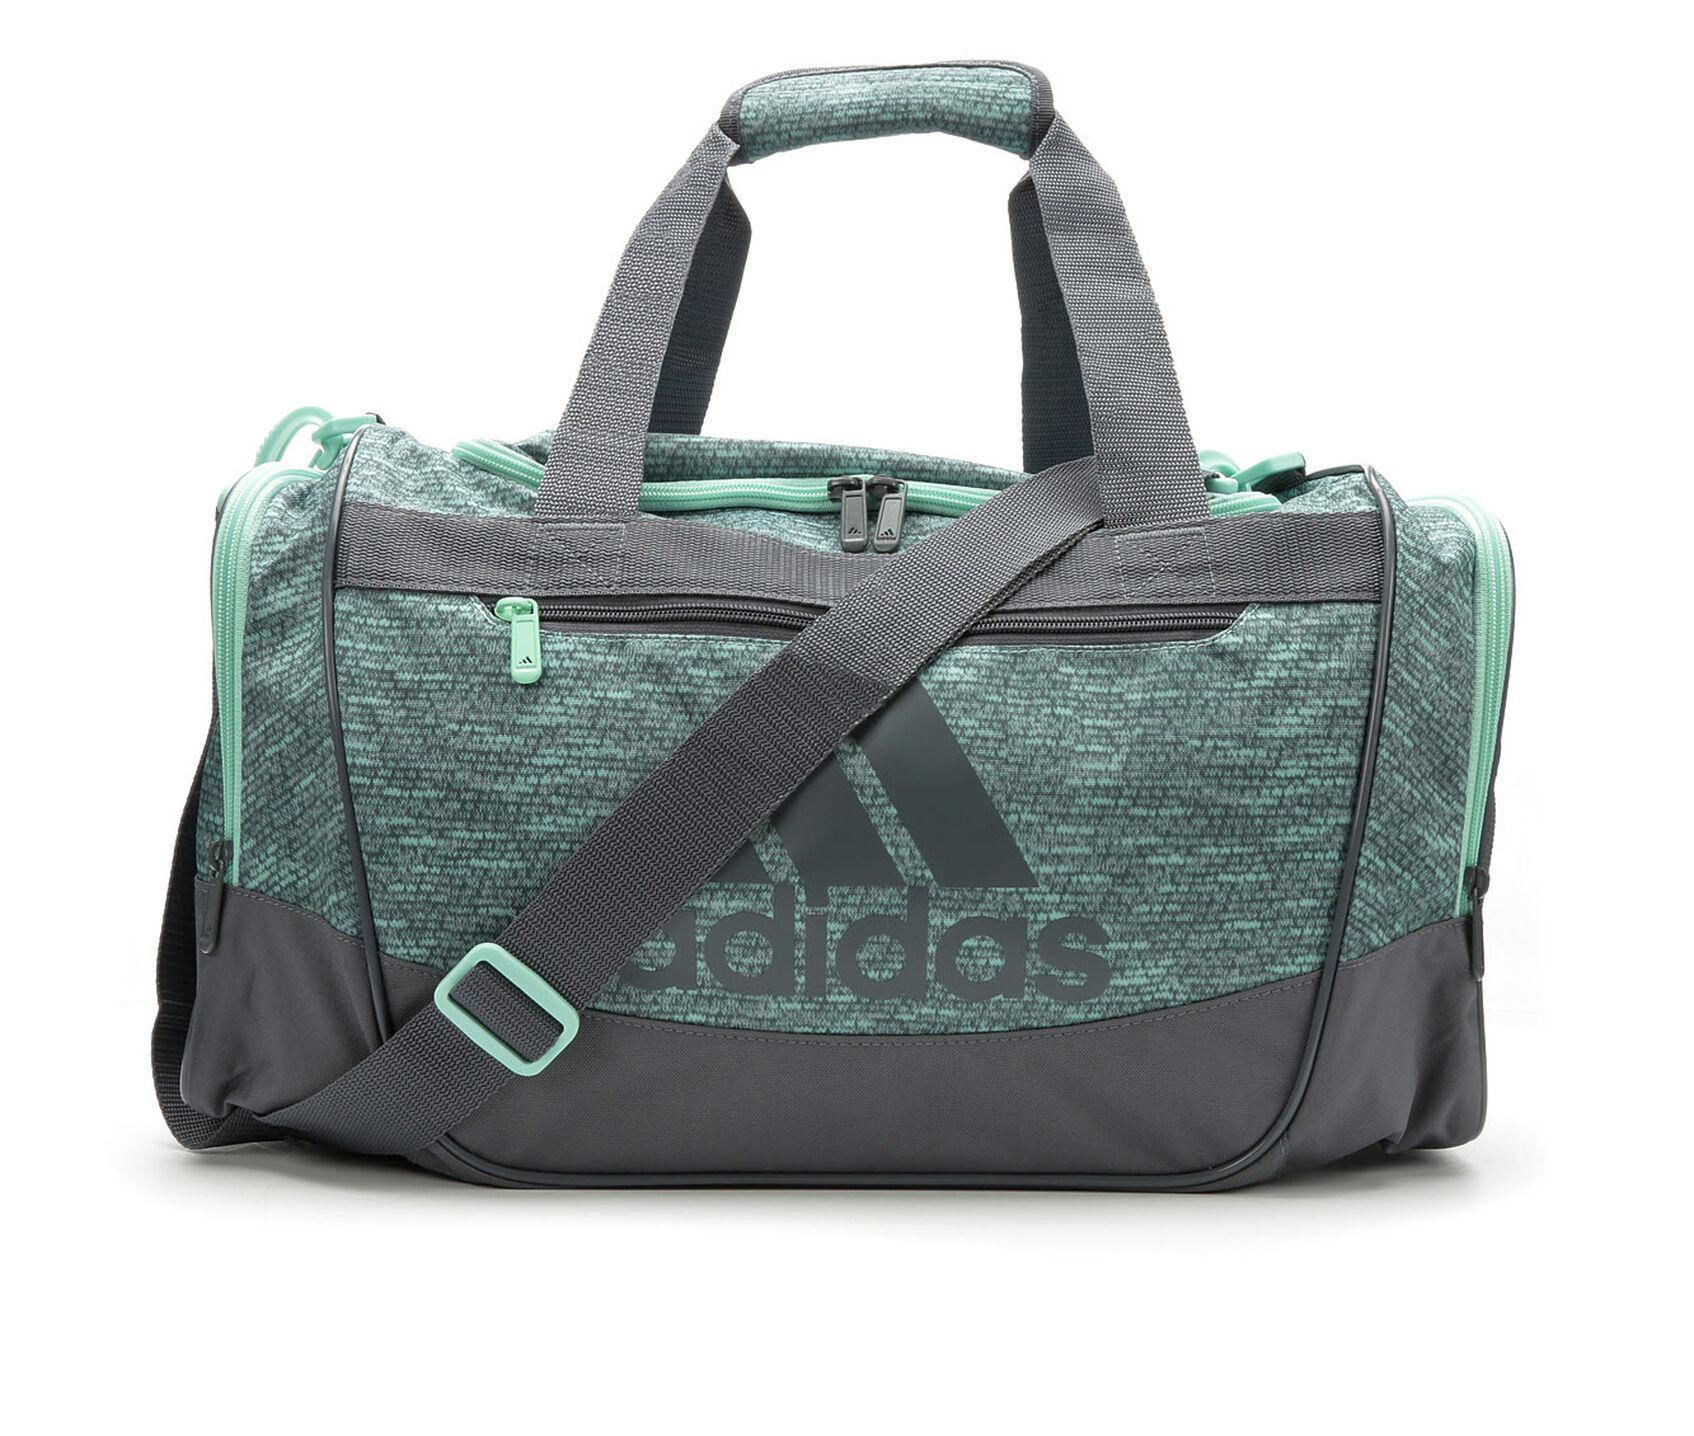 b98c172ba695 Adidas Defender III Small Duffel Bag. Previous